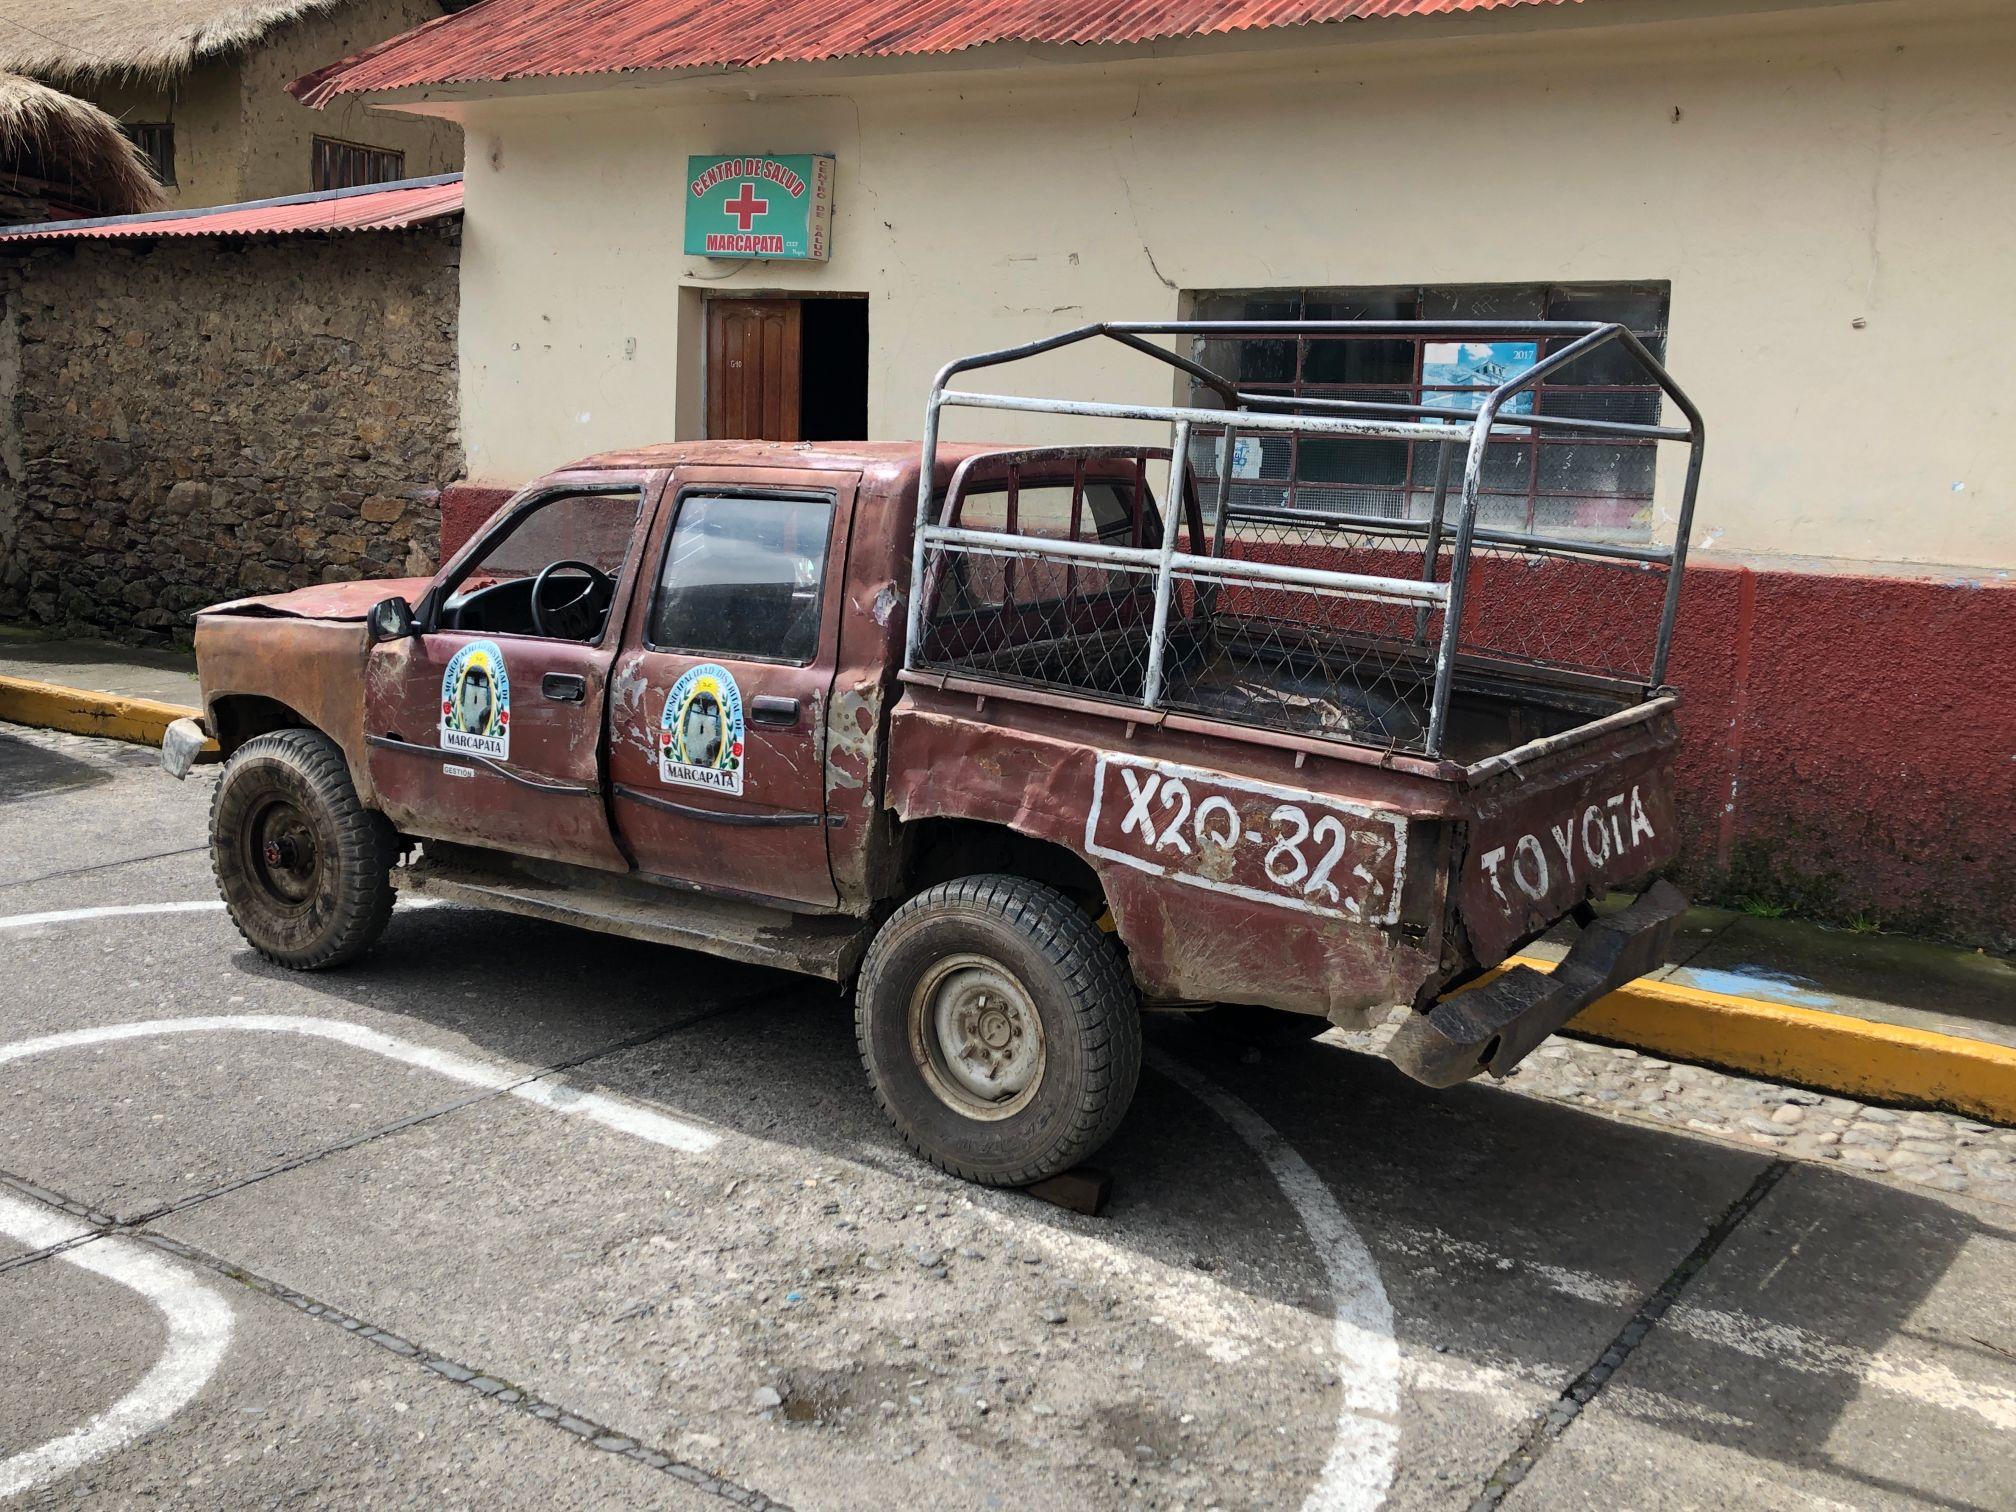 marcapata town truck.jpg